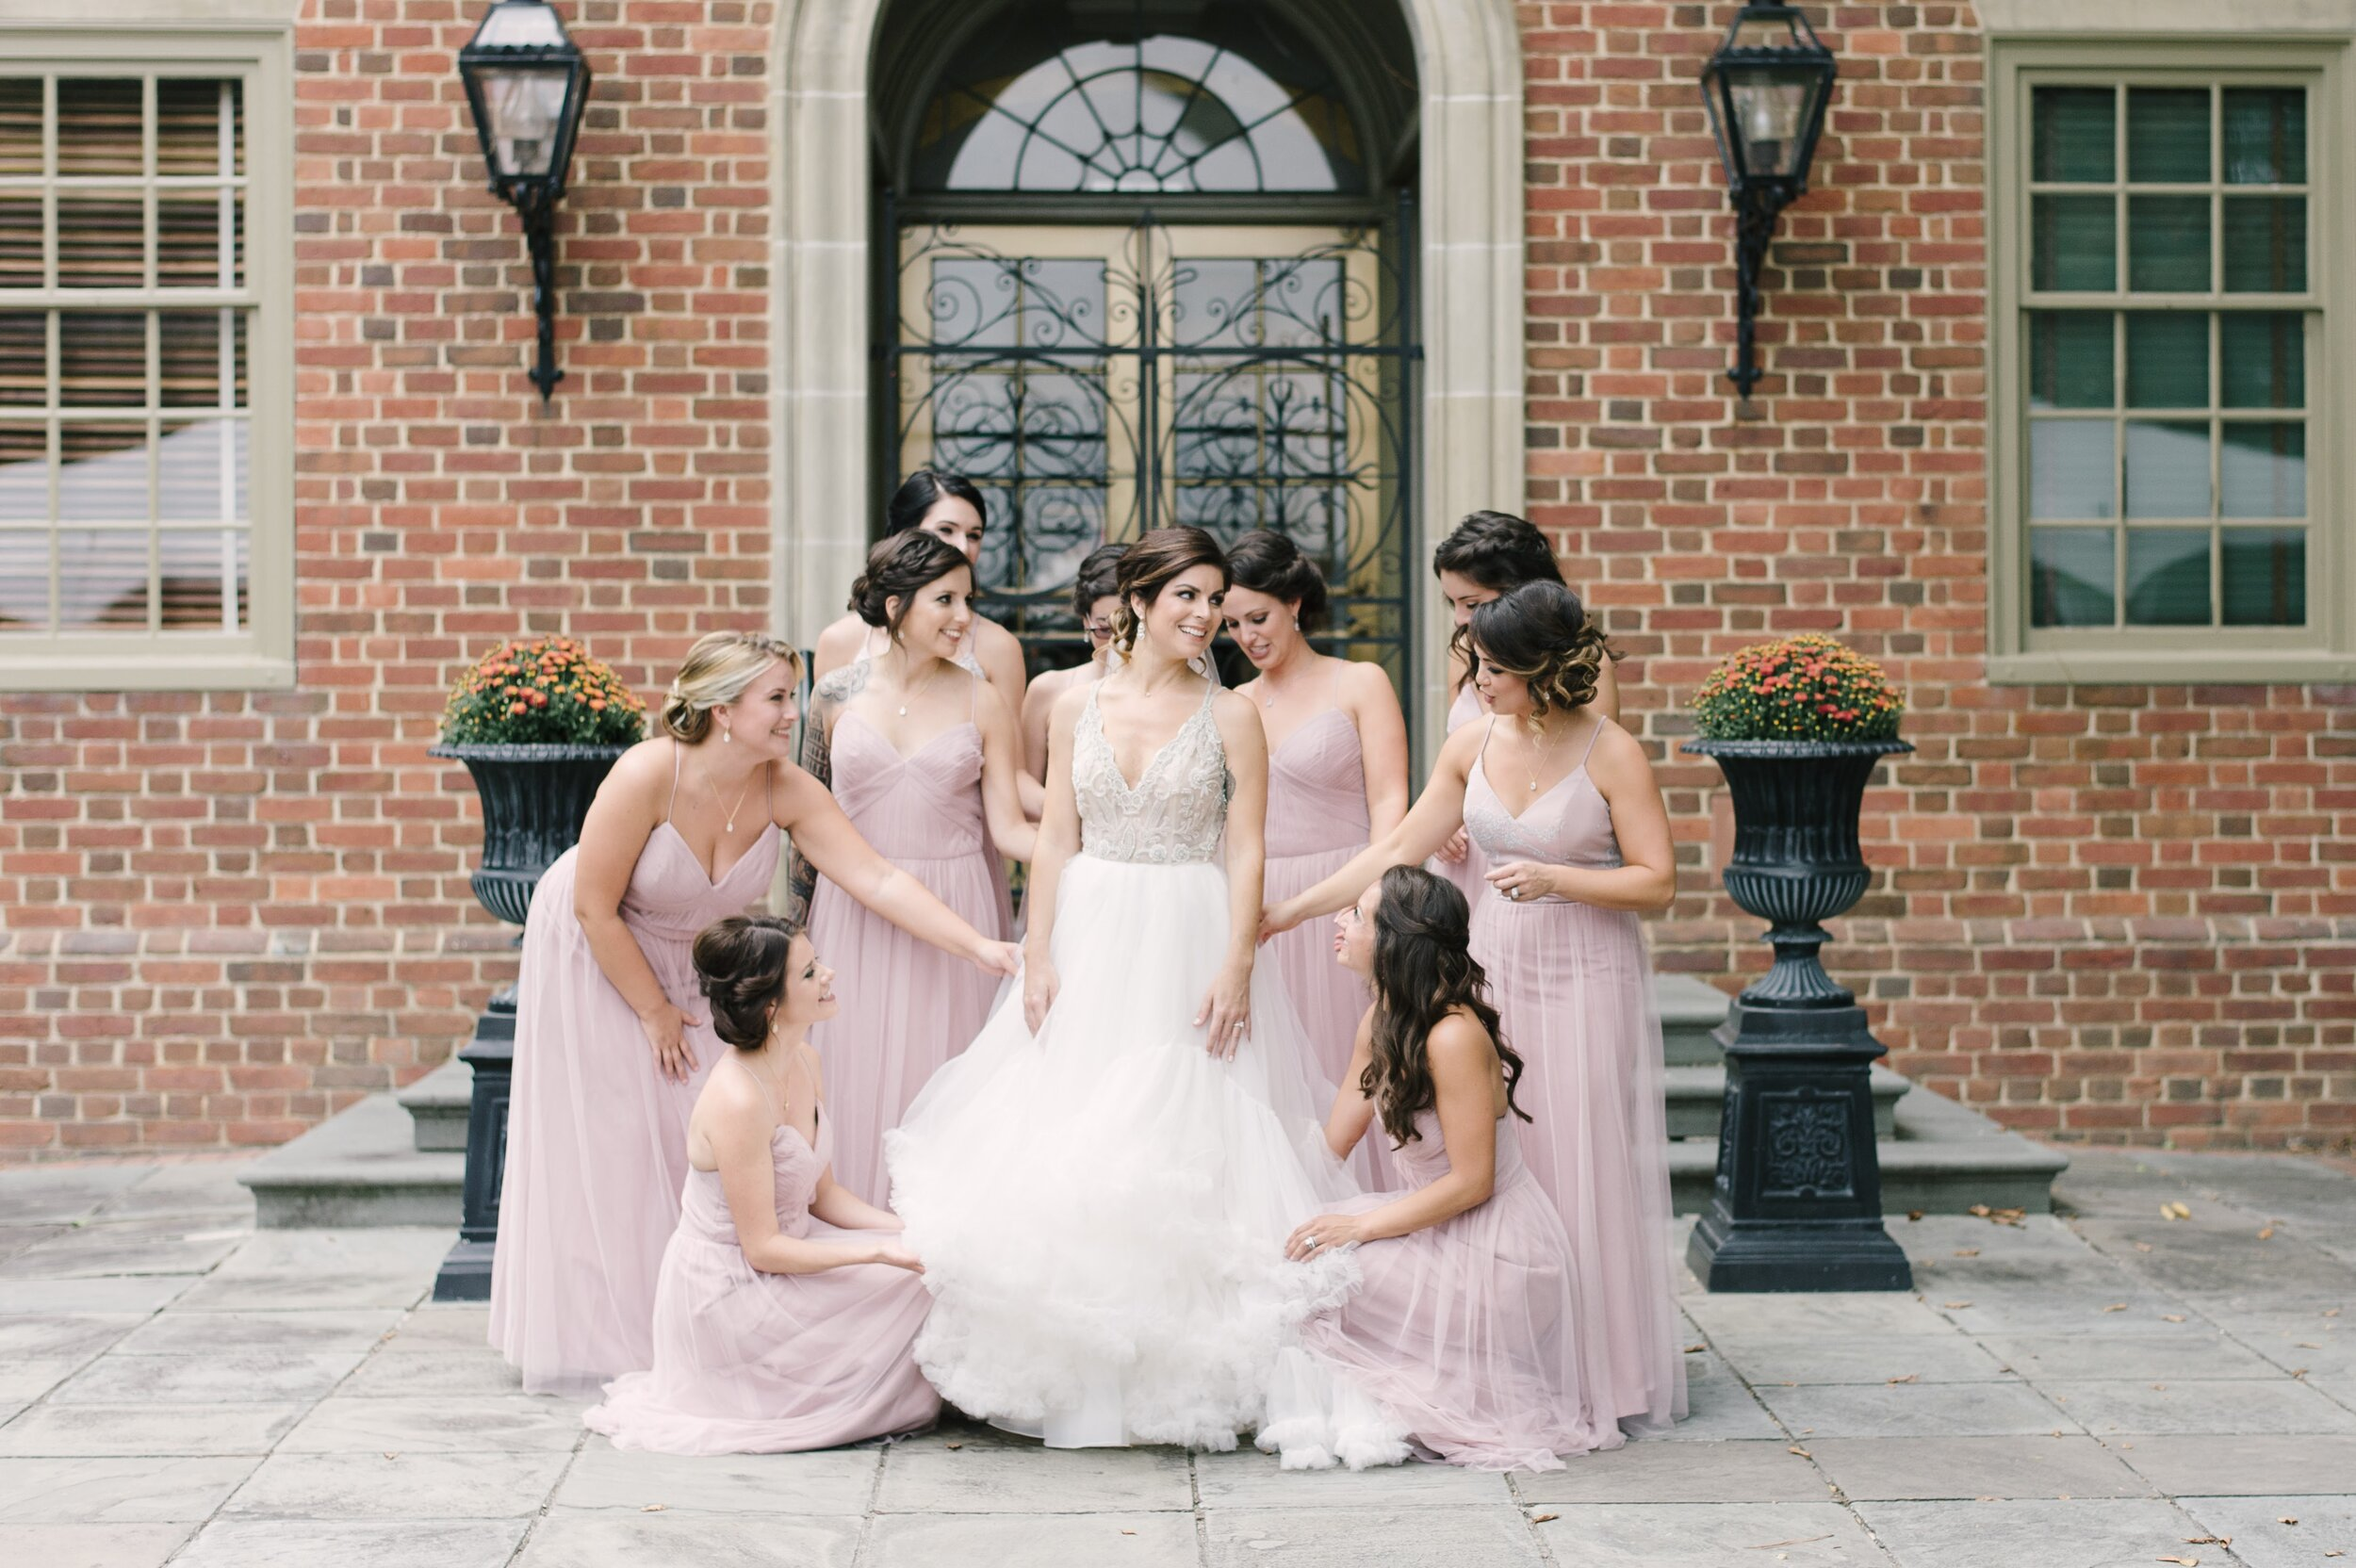 gettingready-wedding-sarah-street-photography-203.jpg